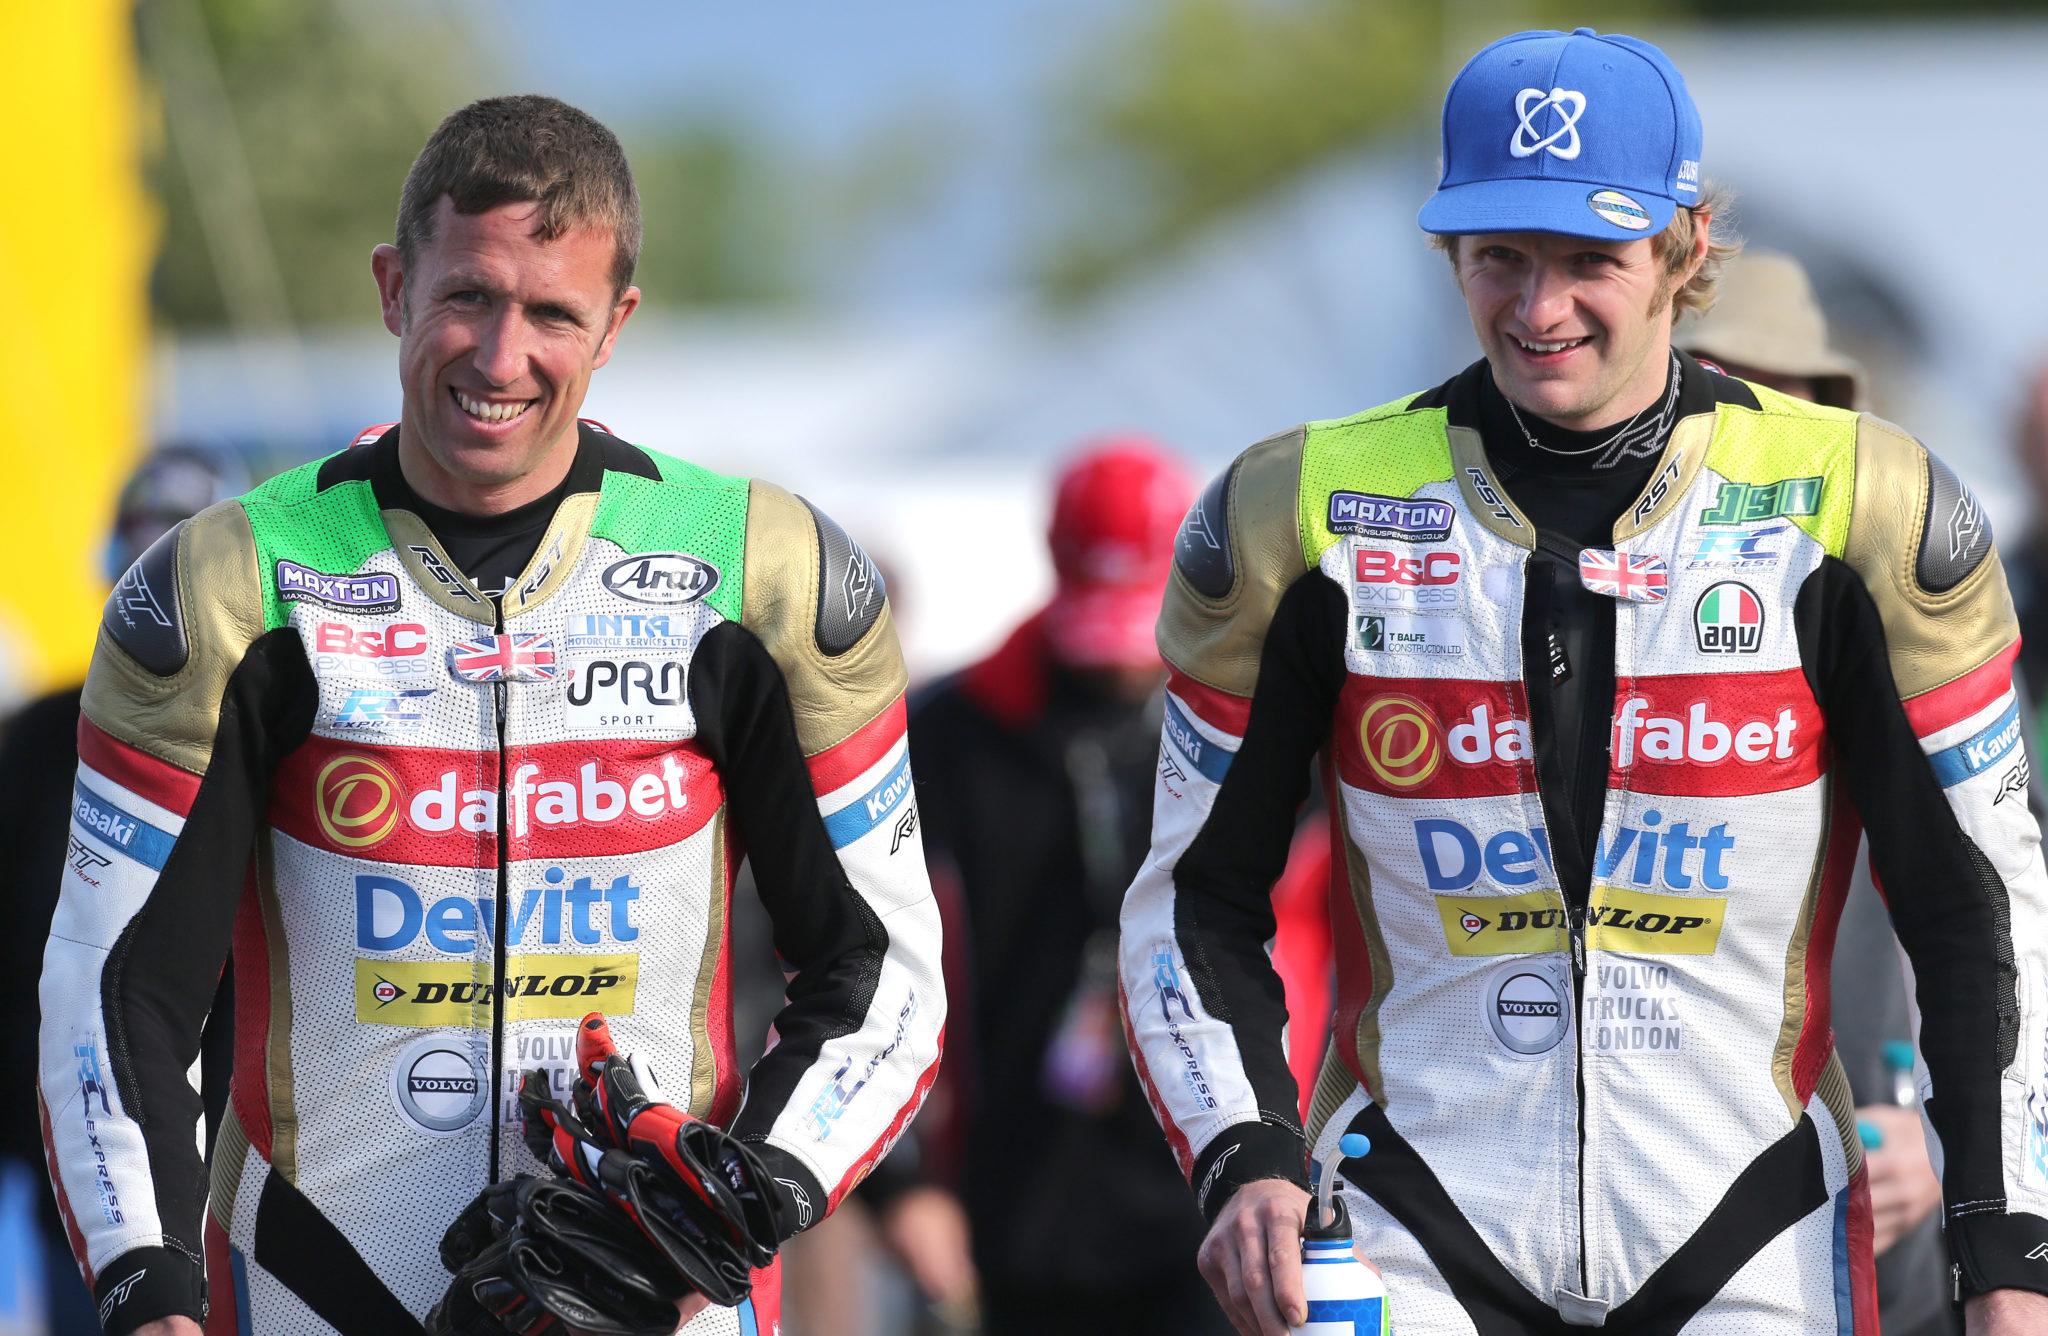 Steve Mercer and Ivan Lintin iomtt 2017 image credit Dafabet Devitt Racing